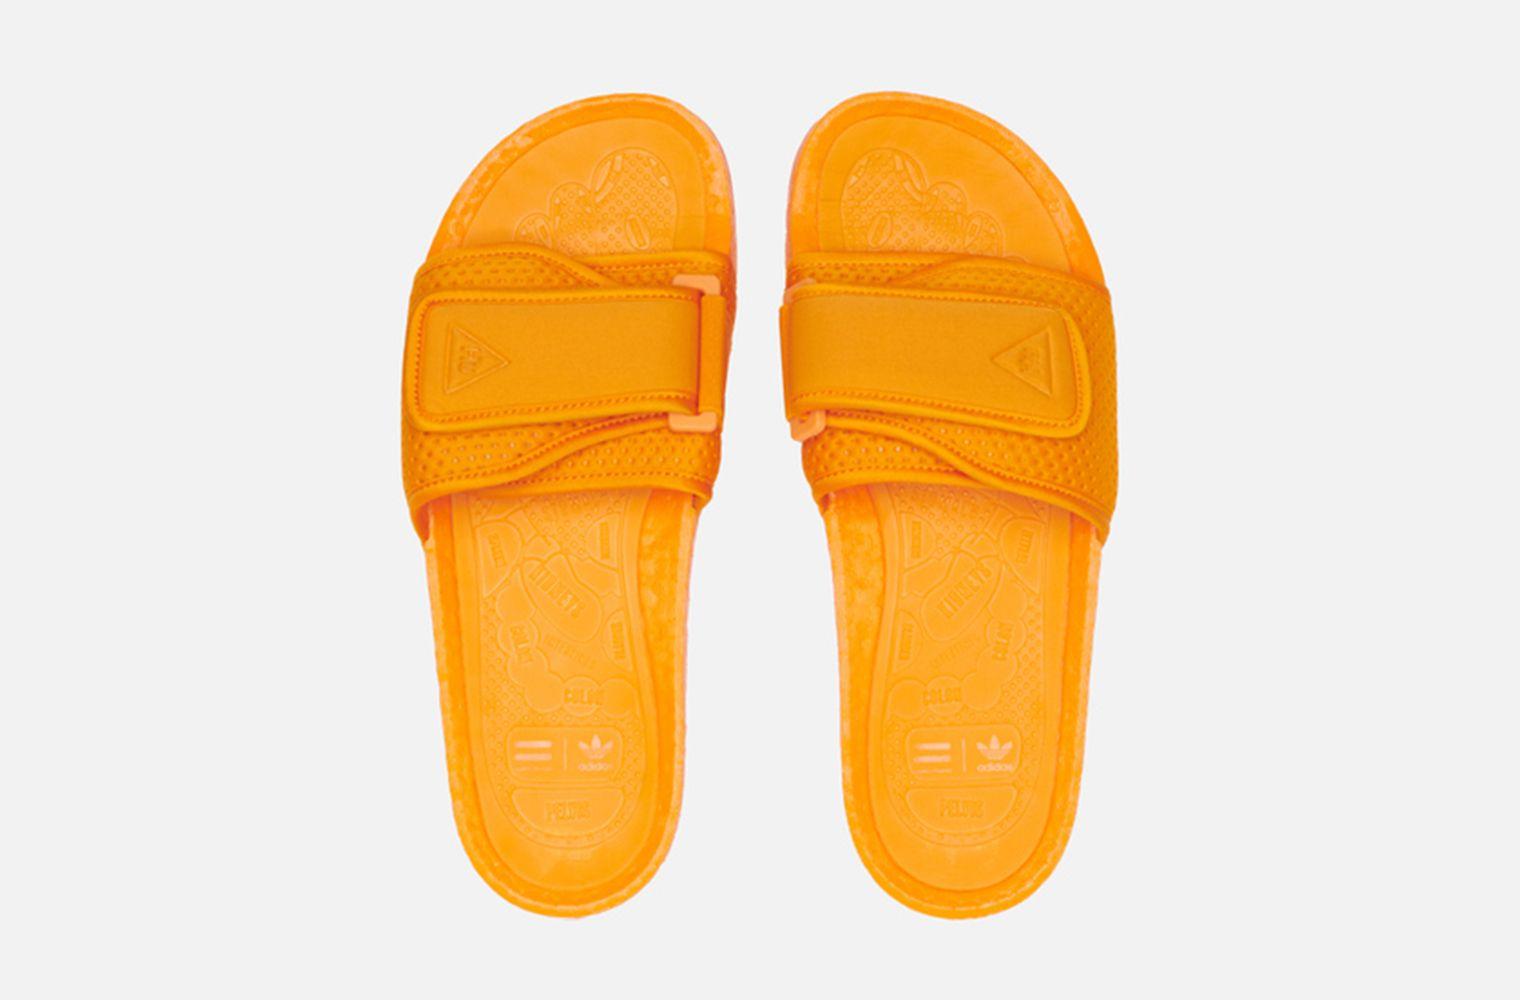 Pharrell Williams x adidas Boost Slide детали релиза